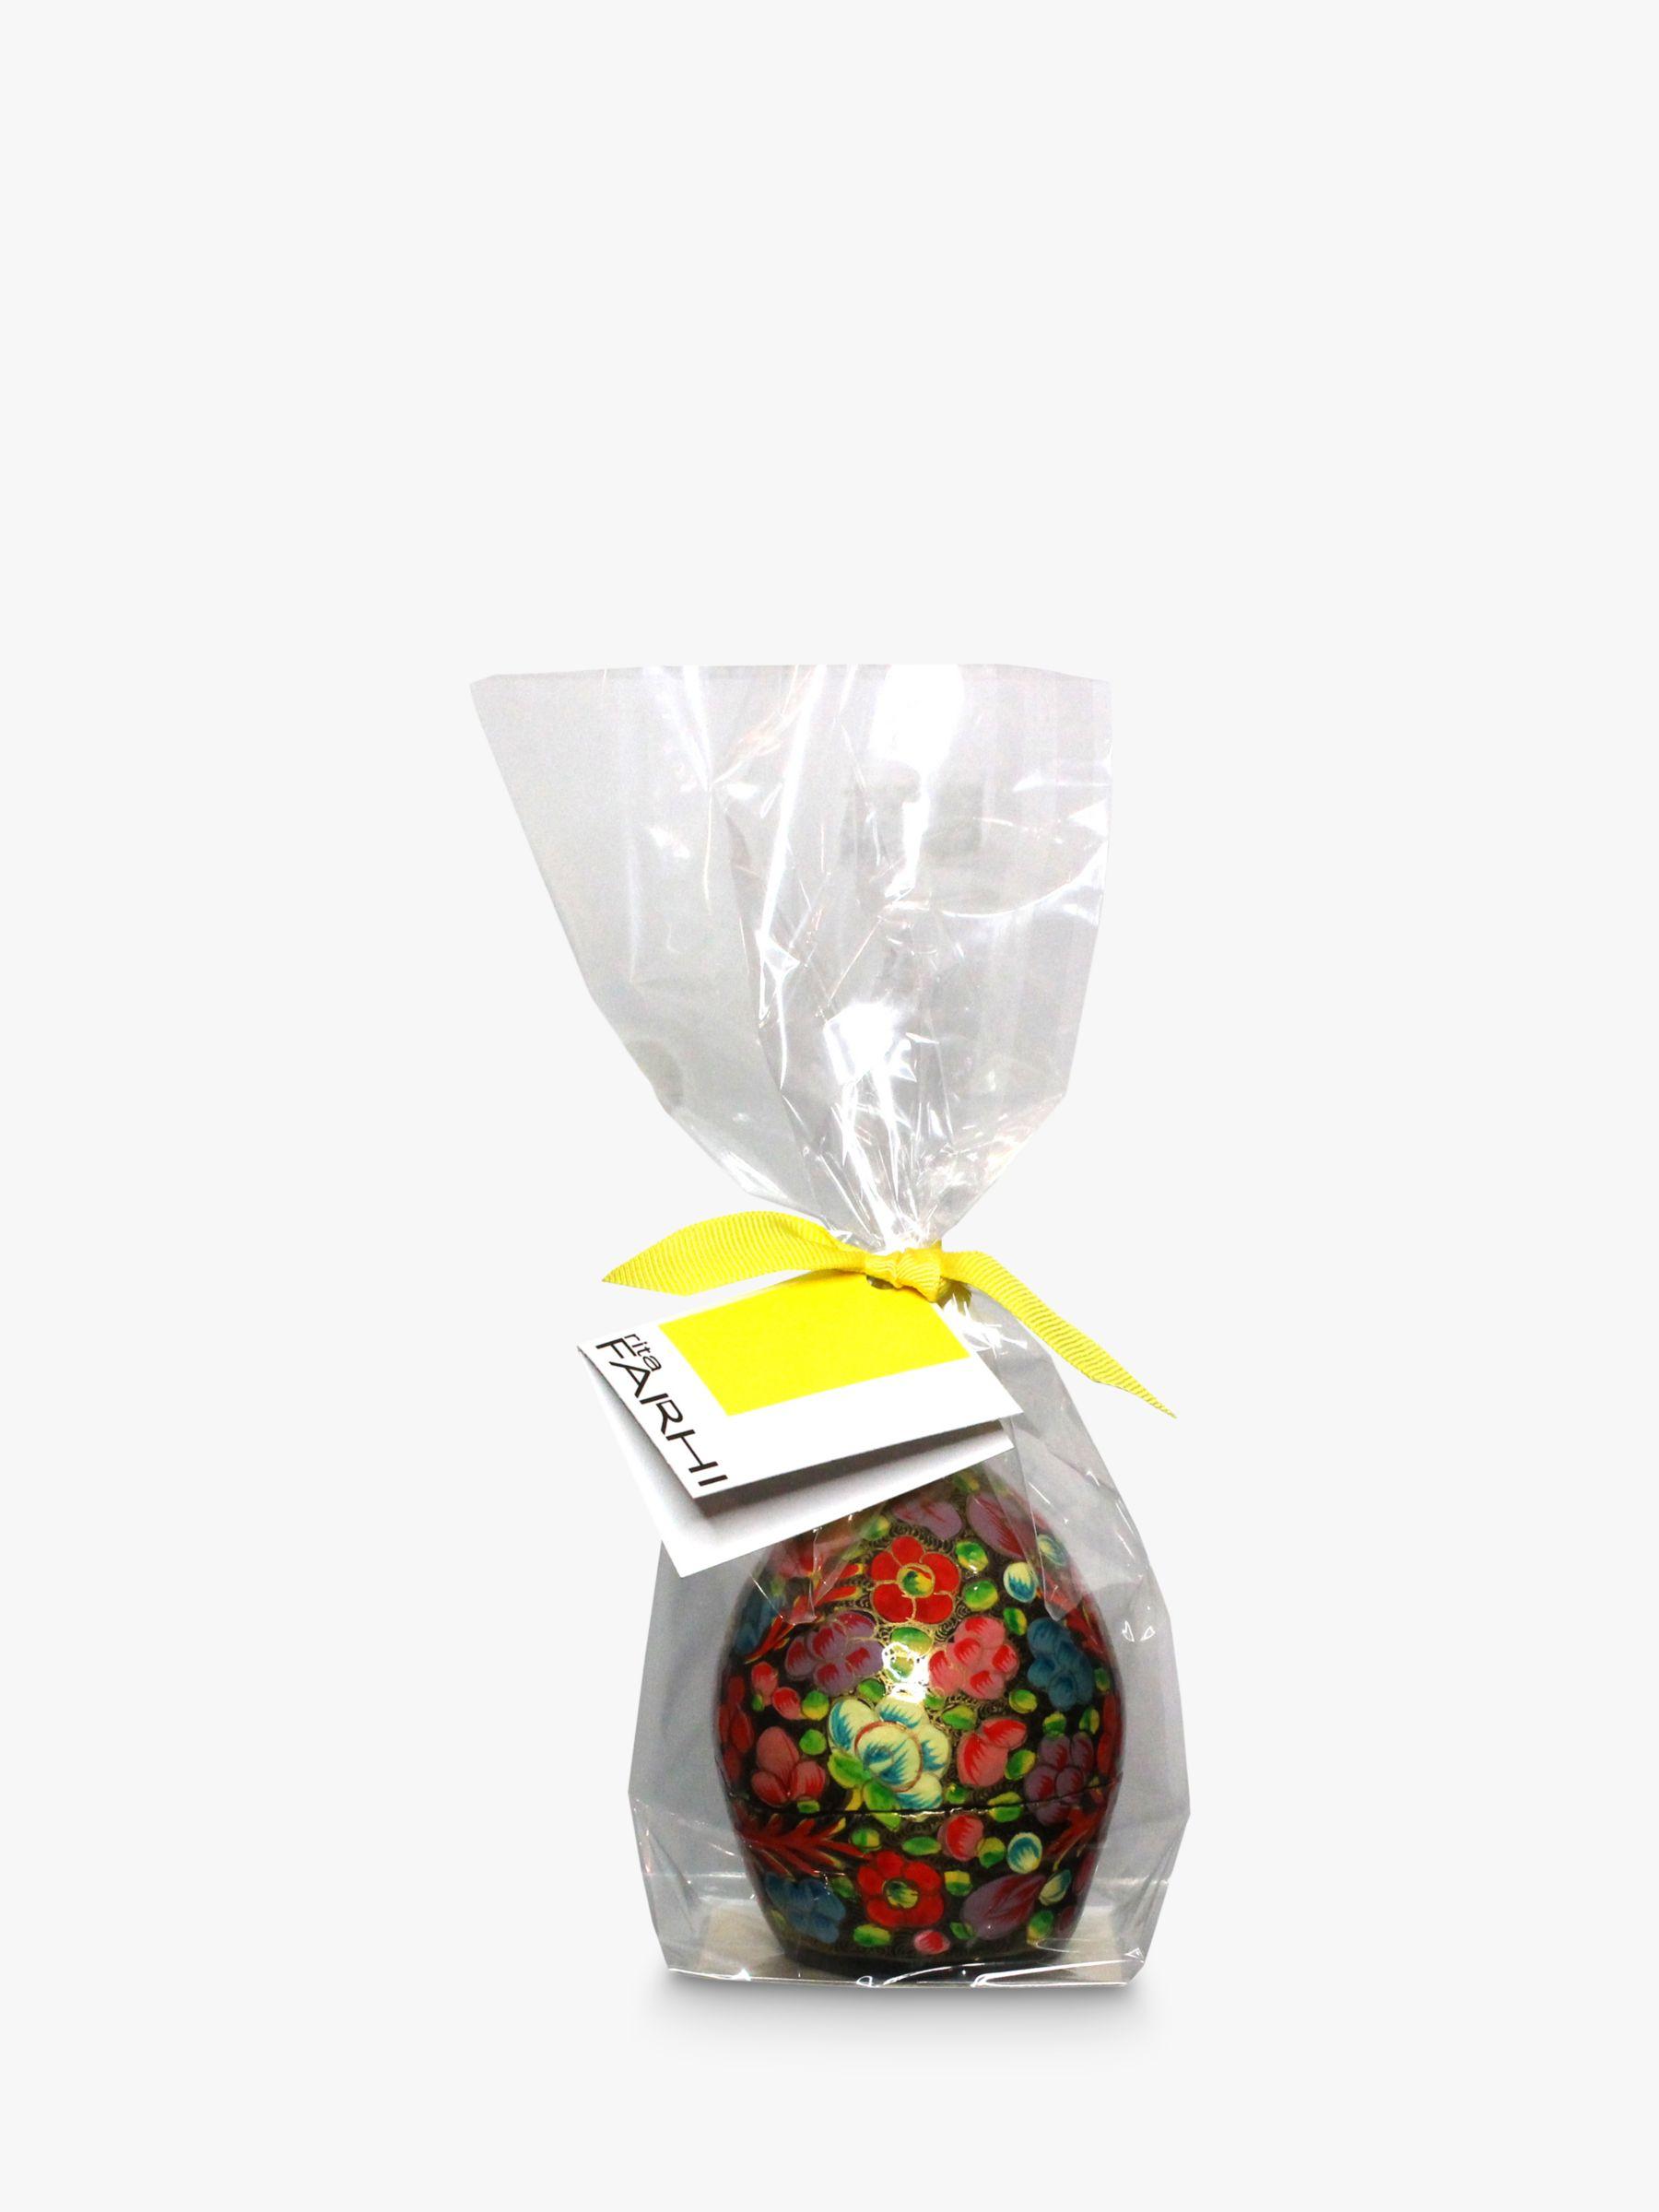 Farhi Farhi Papier Mache Easter Egg, Red, 40g